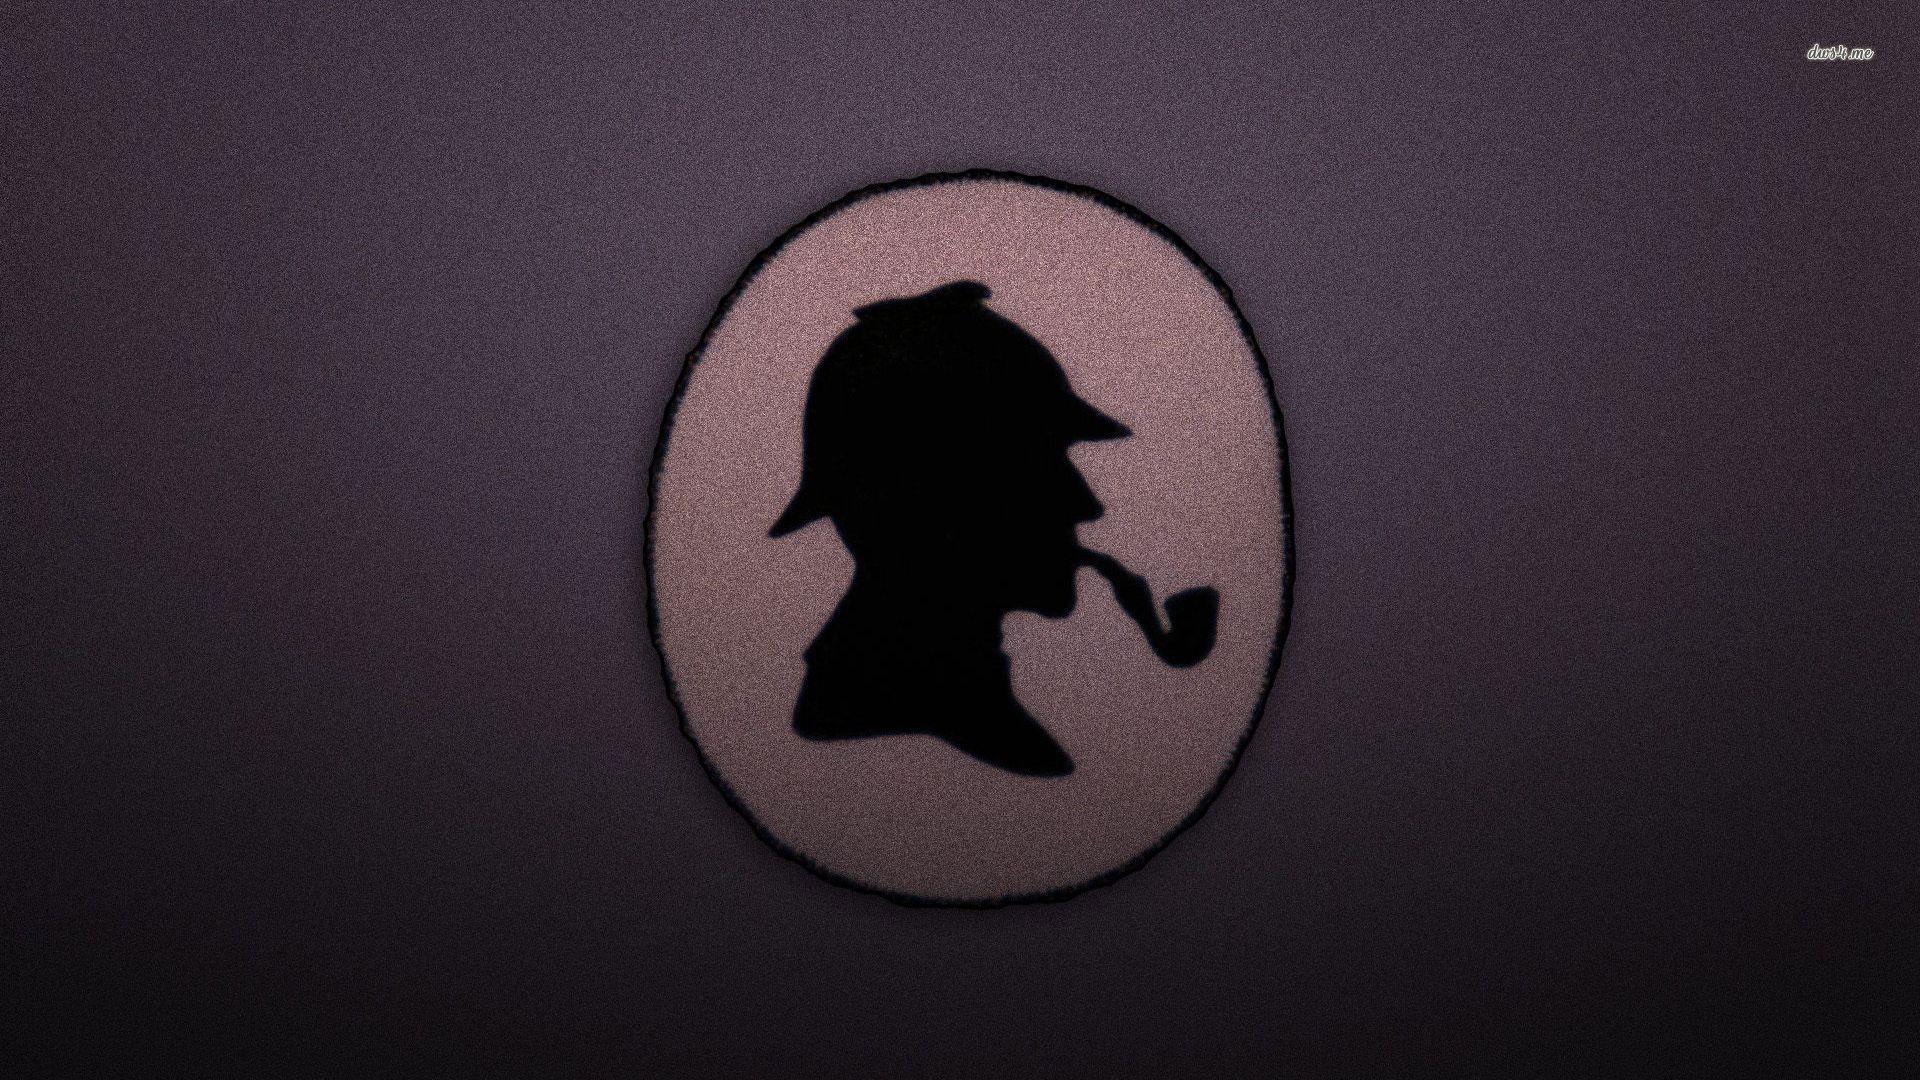 Sherlock Holmes Wallpapers Android For Hd Wallpaper Desktop